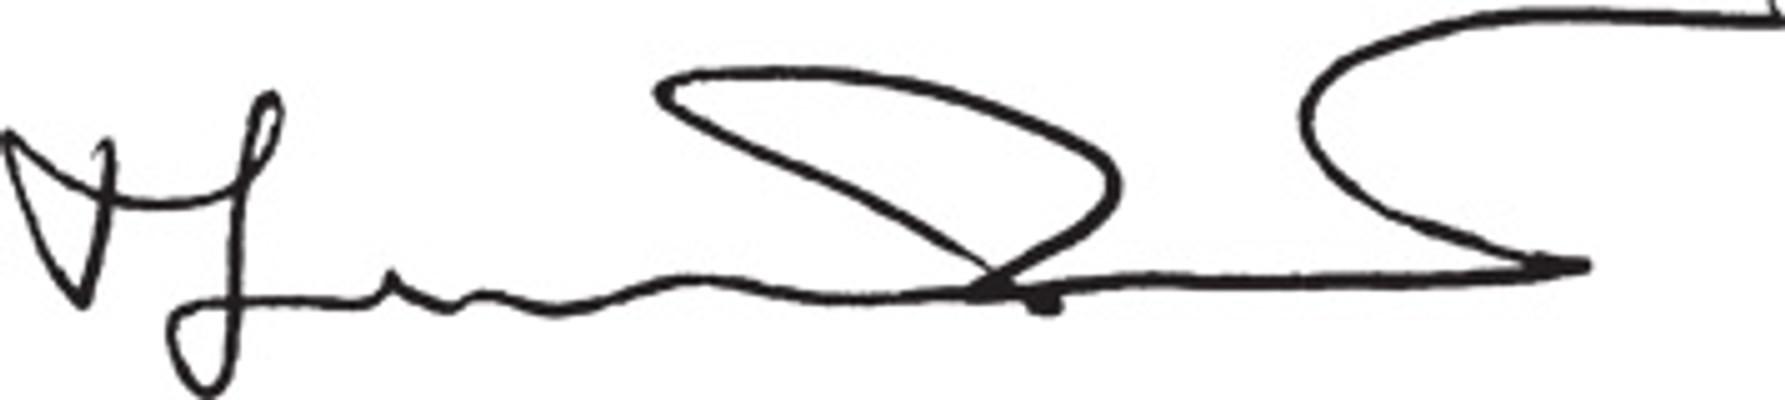 f0004-03